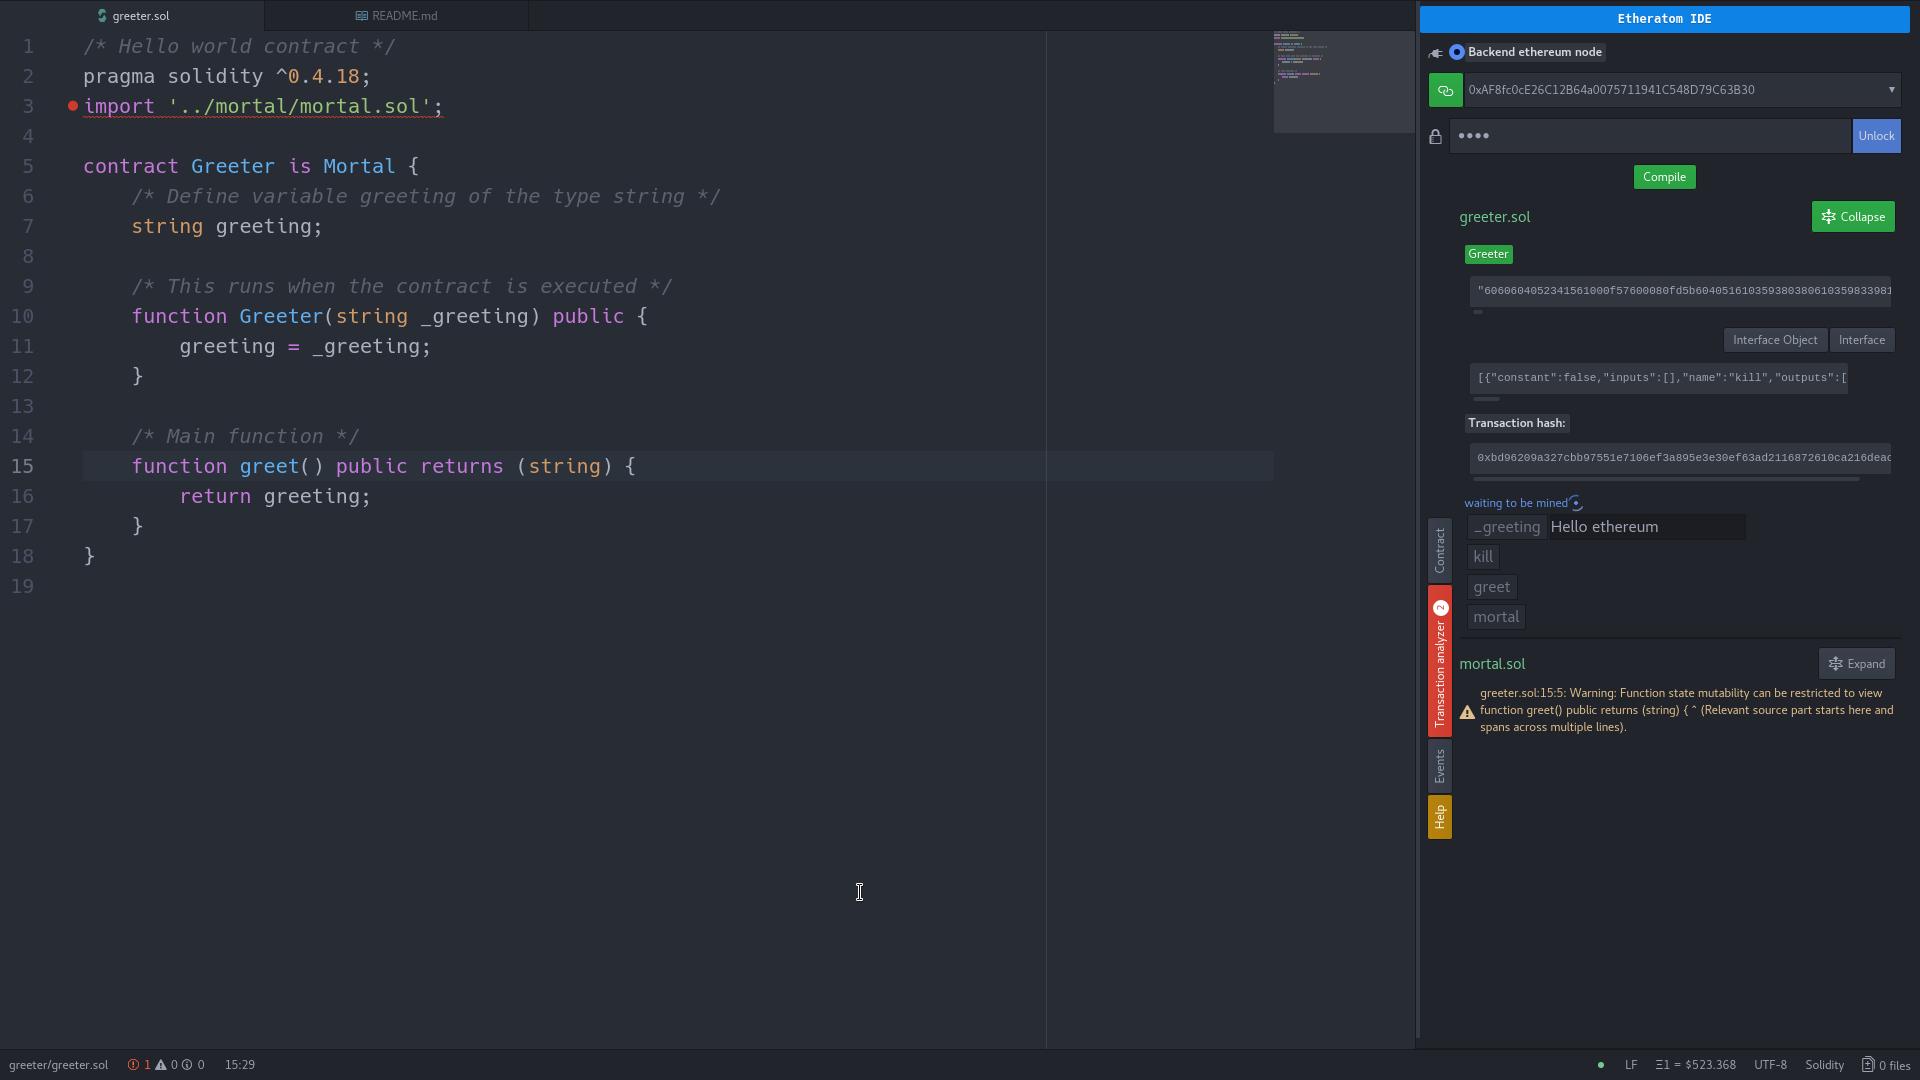 A screenshot of Etheratom package